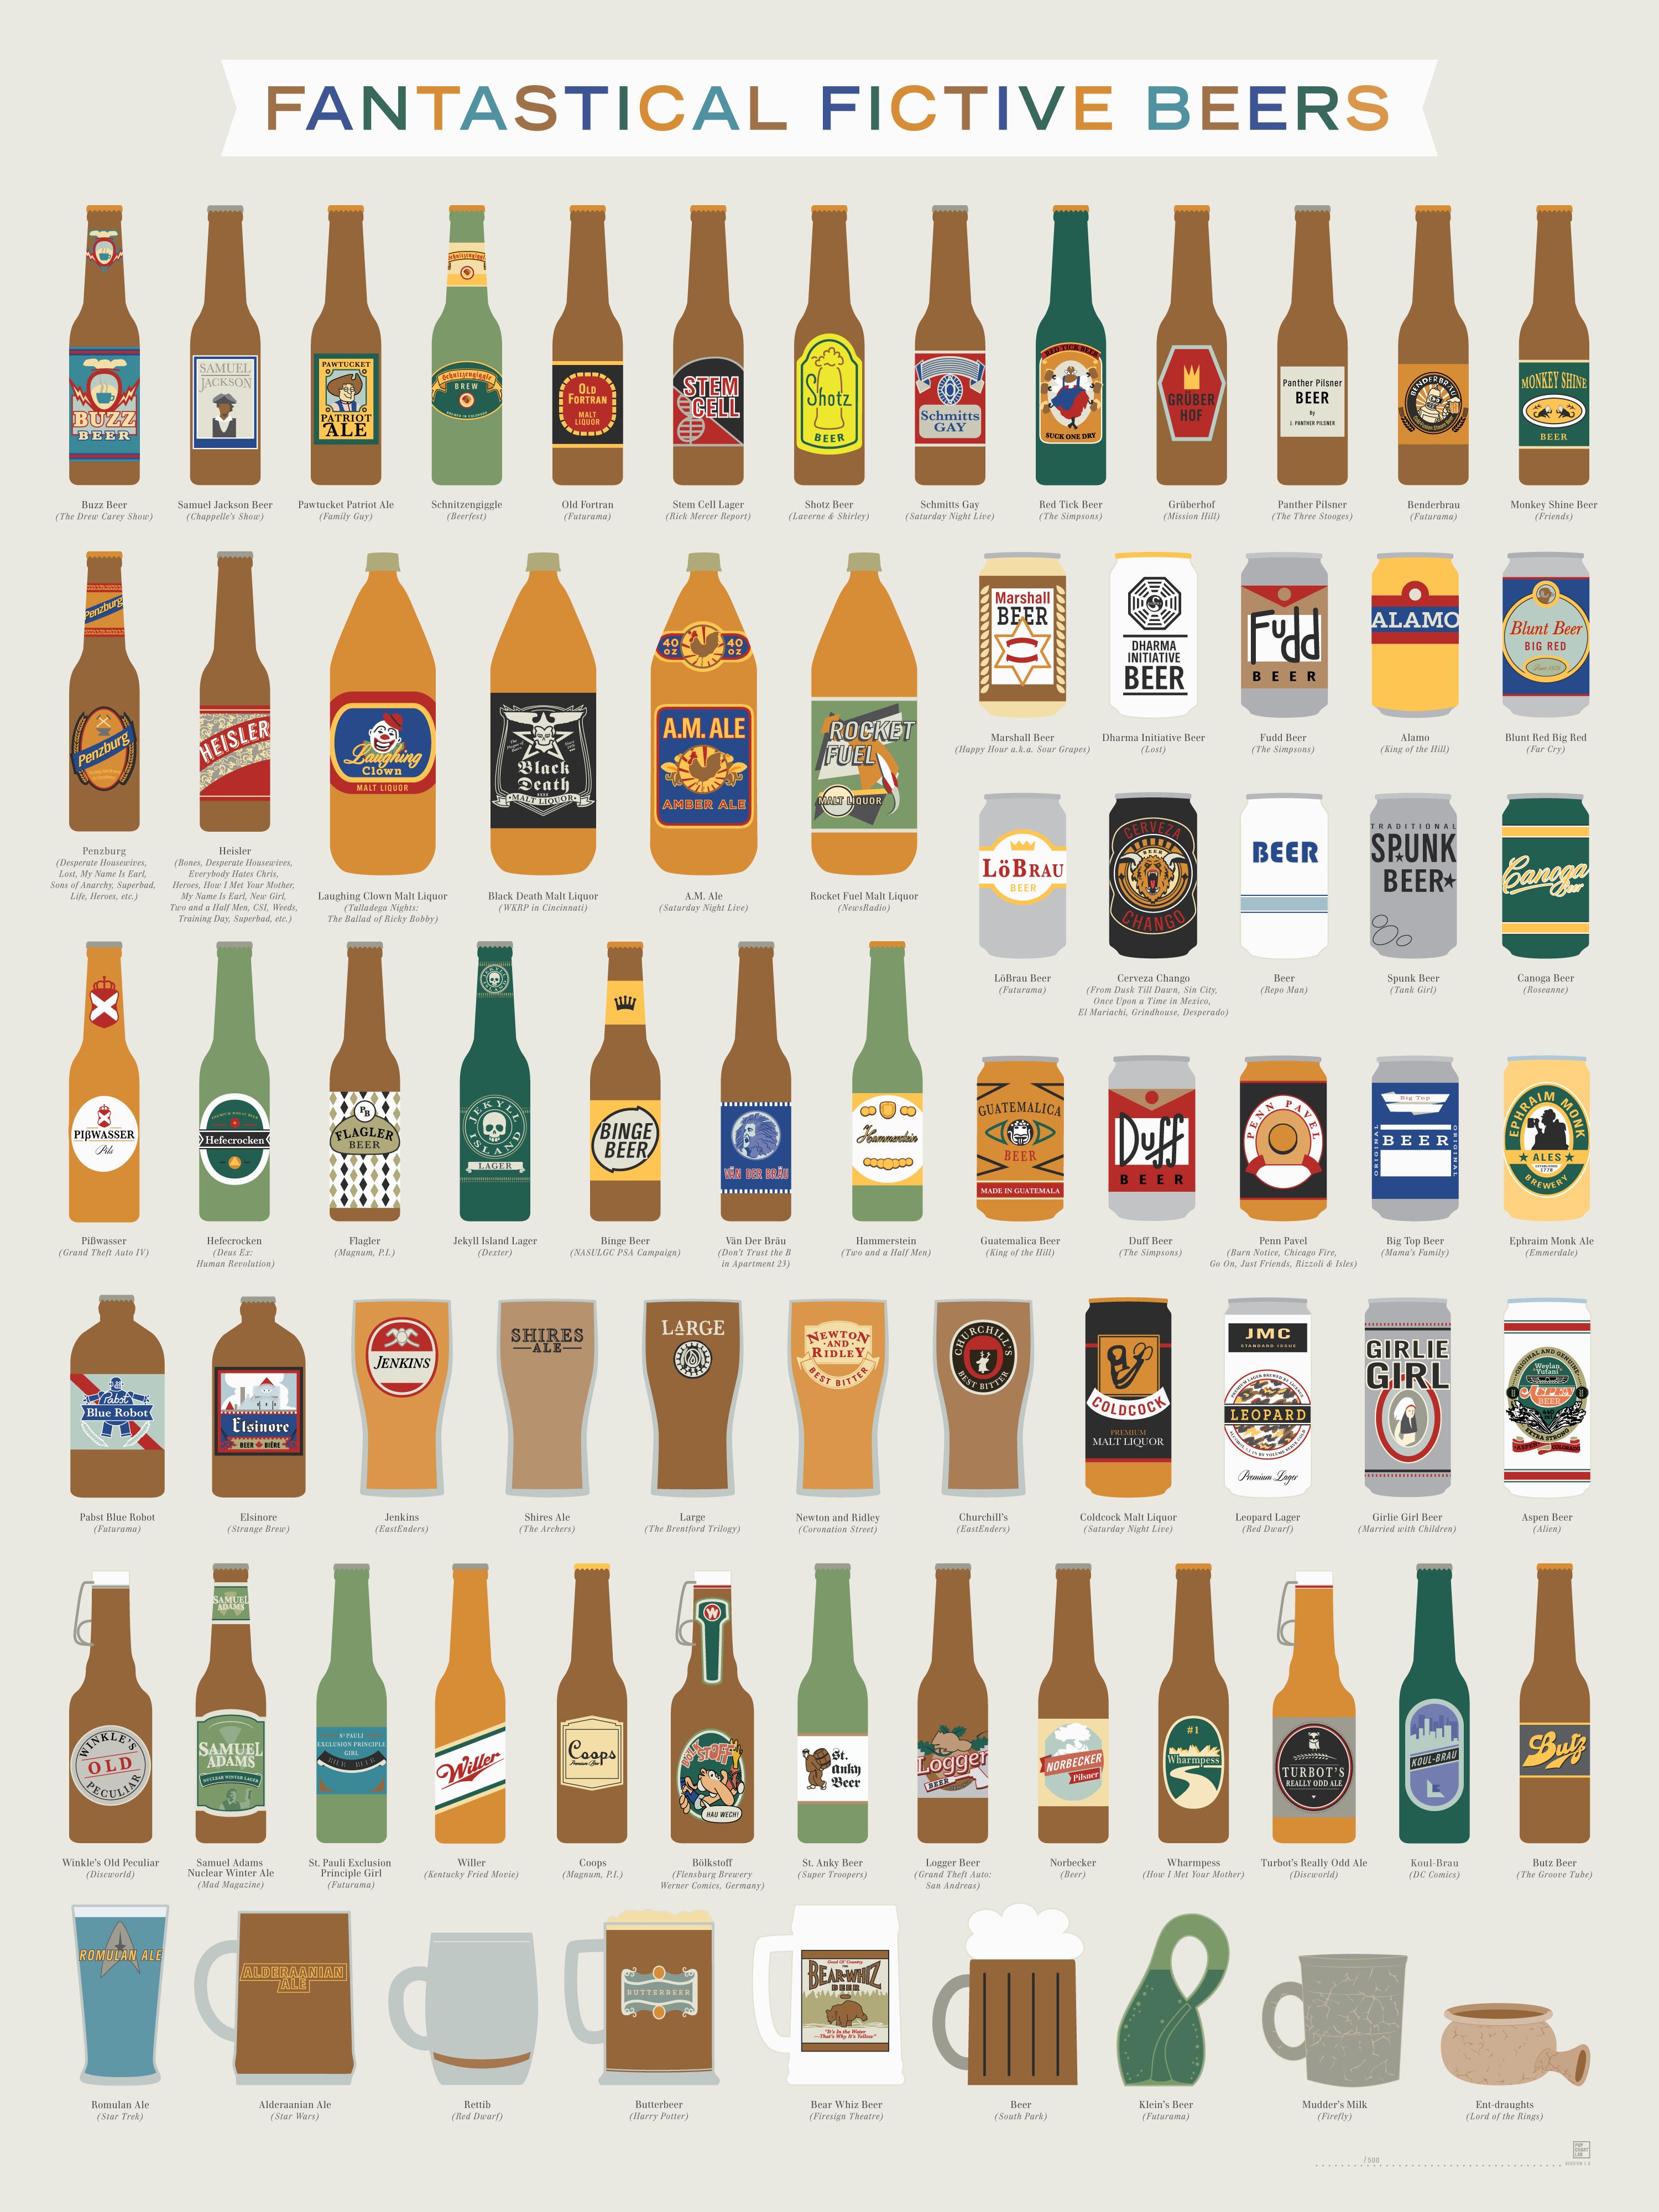 Fantastical Fictive Beers | BLDGWLF